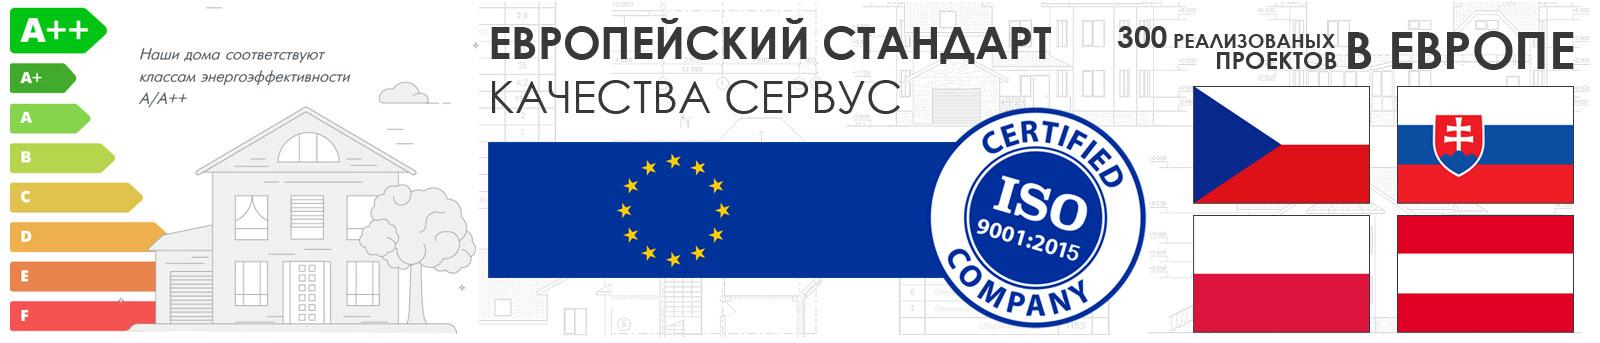 euro_standart